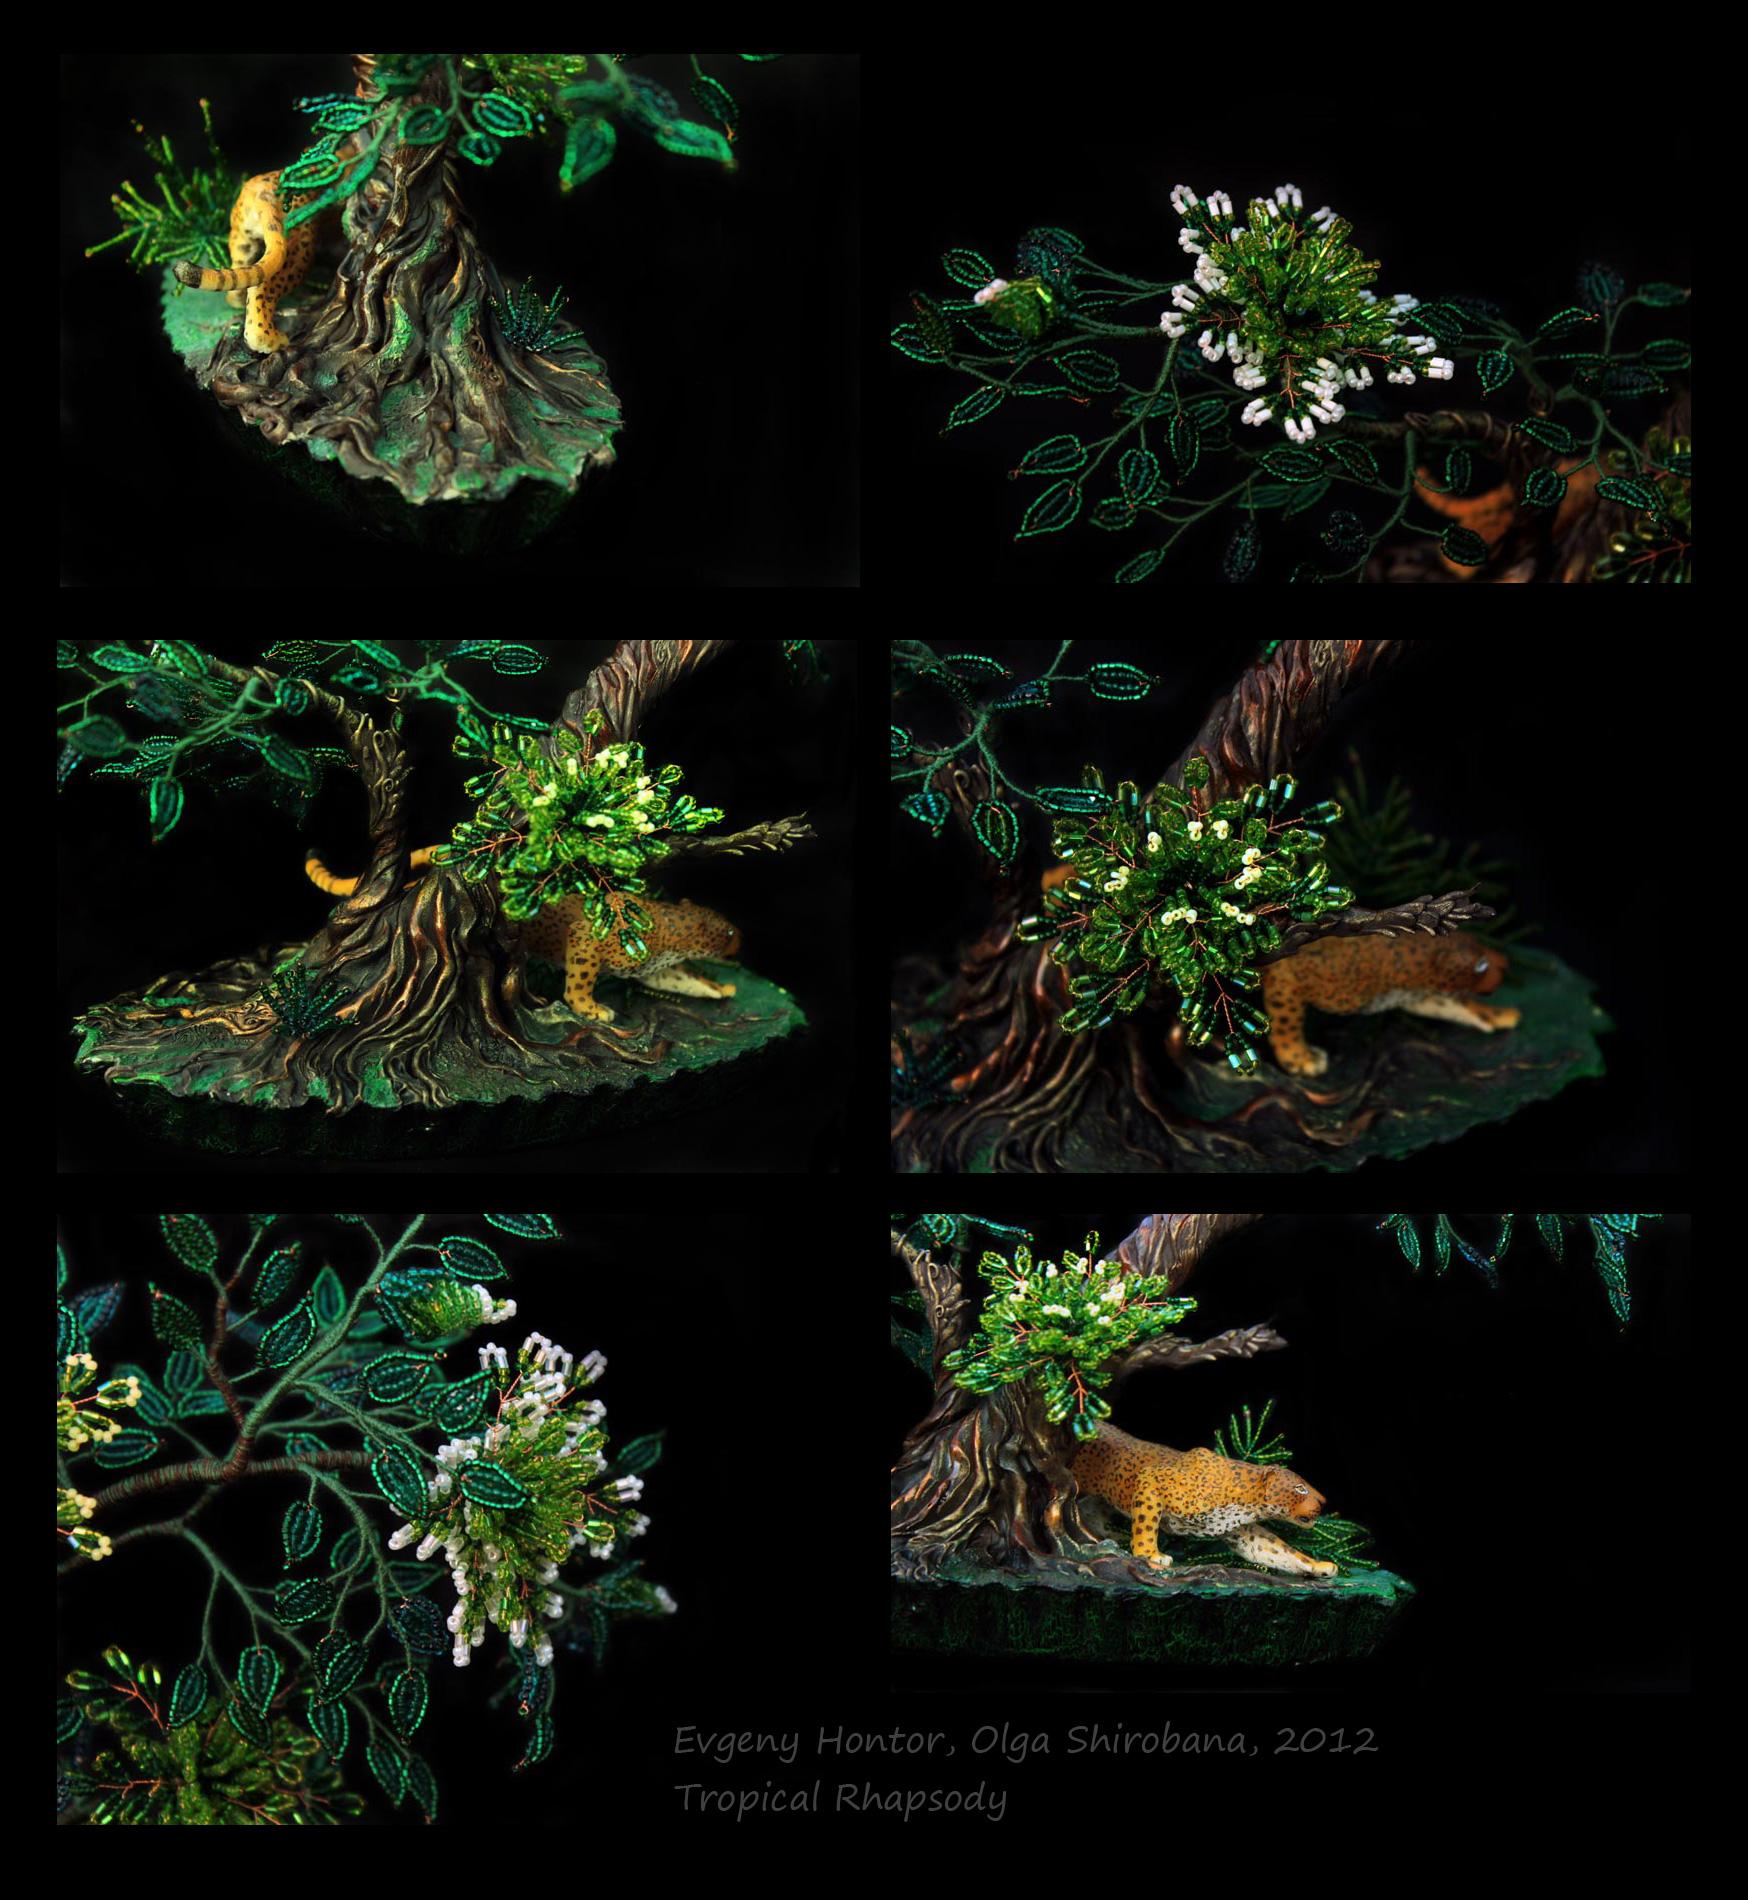 Tropical Rhapsody II by hontor